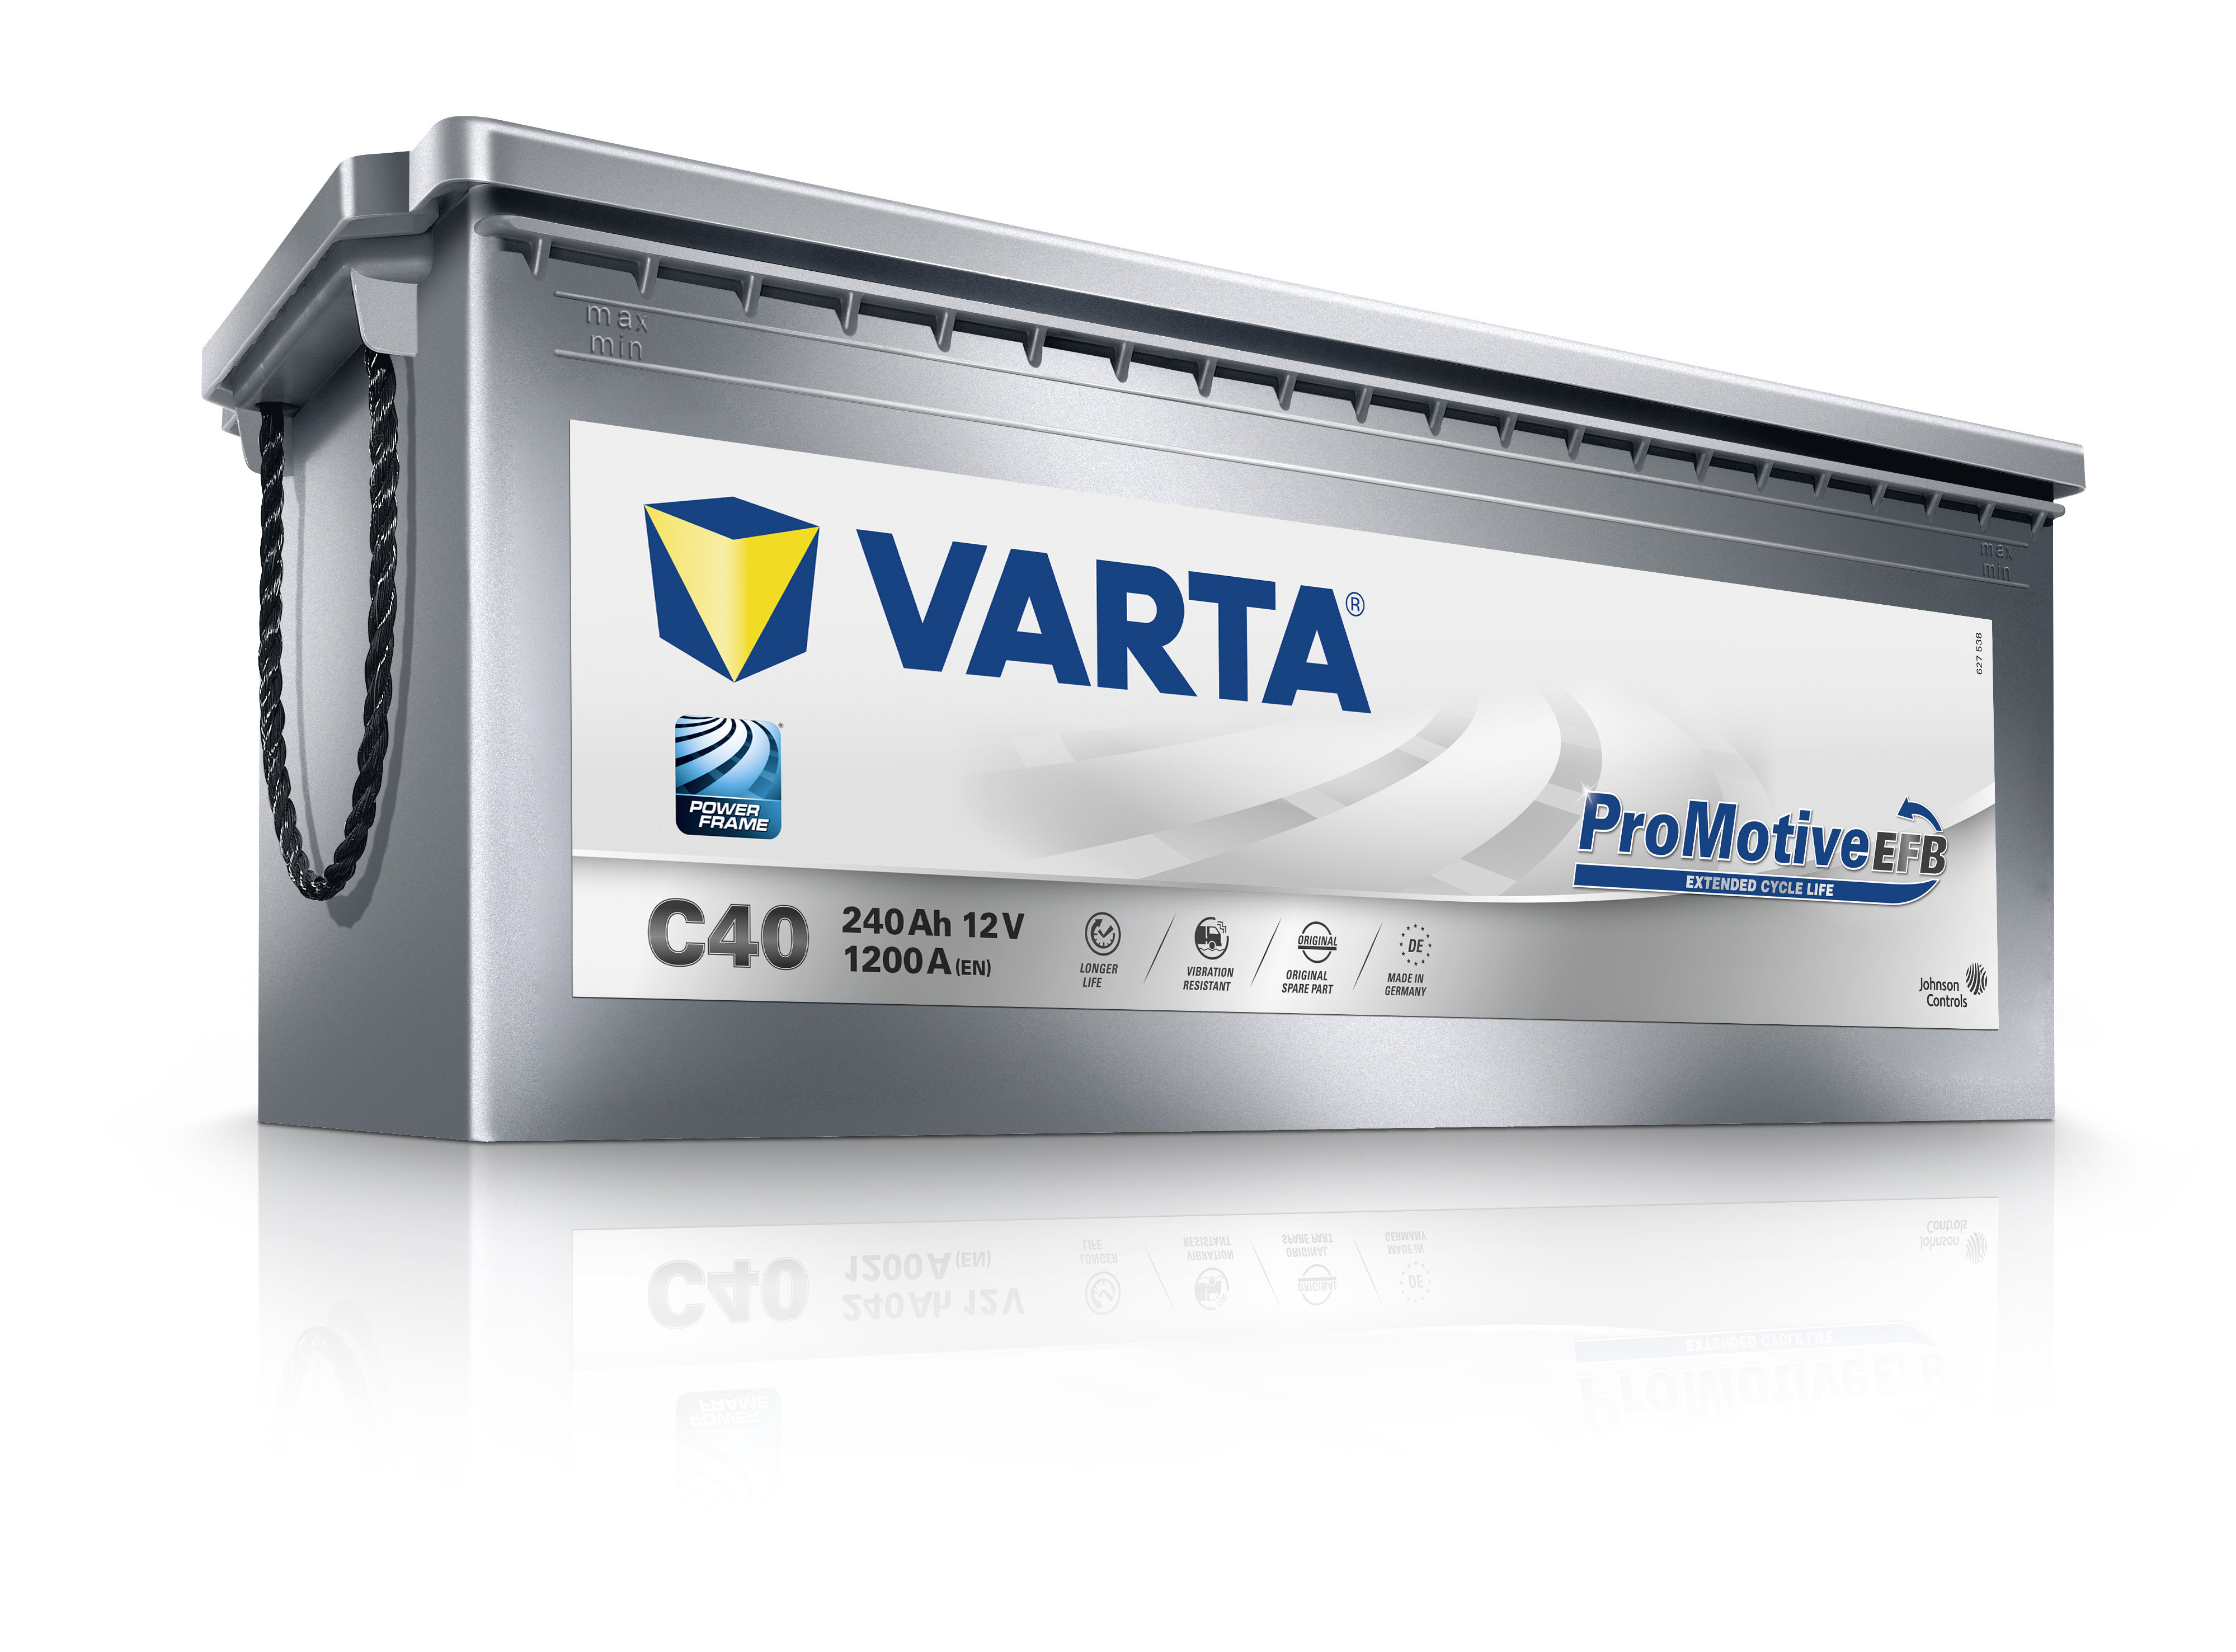 VARTA Varta Promotive Silver EFB - 12v 240ah - teherautó akkumulátor